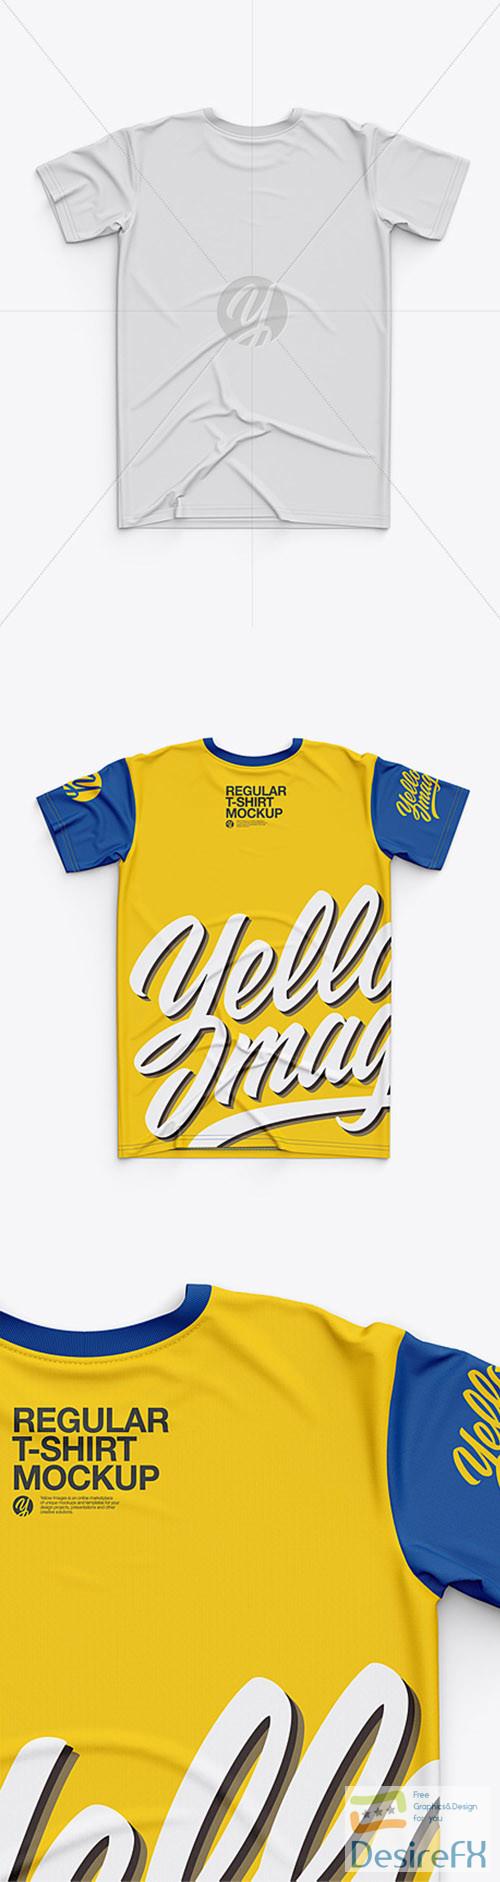 t-shirts-prints - Mens Classic Regular T-Shirt Back Side - Top View 30429 TIF